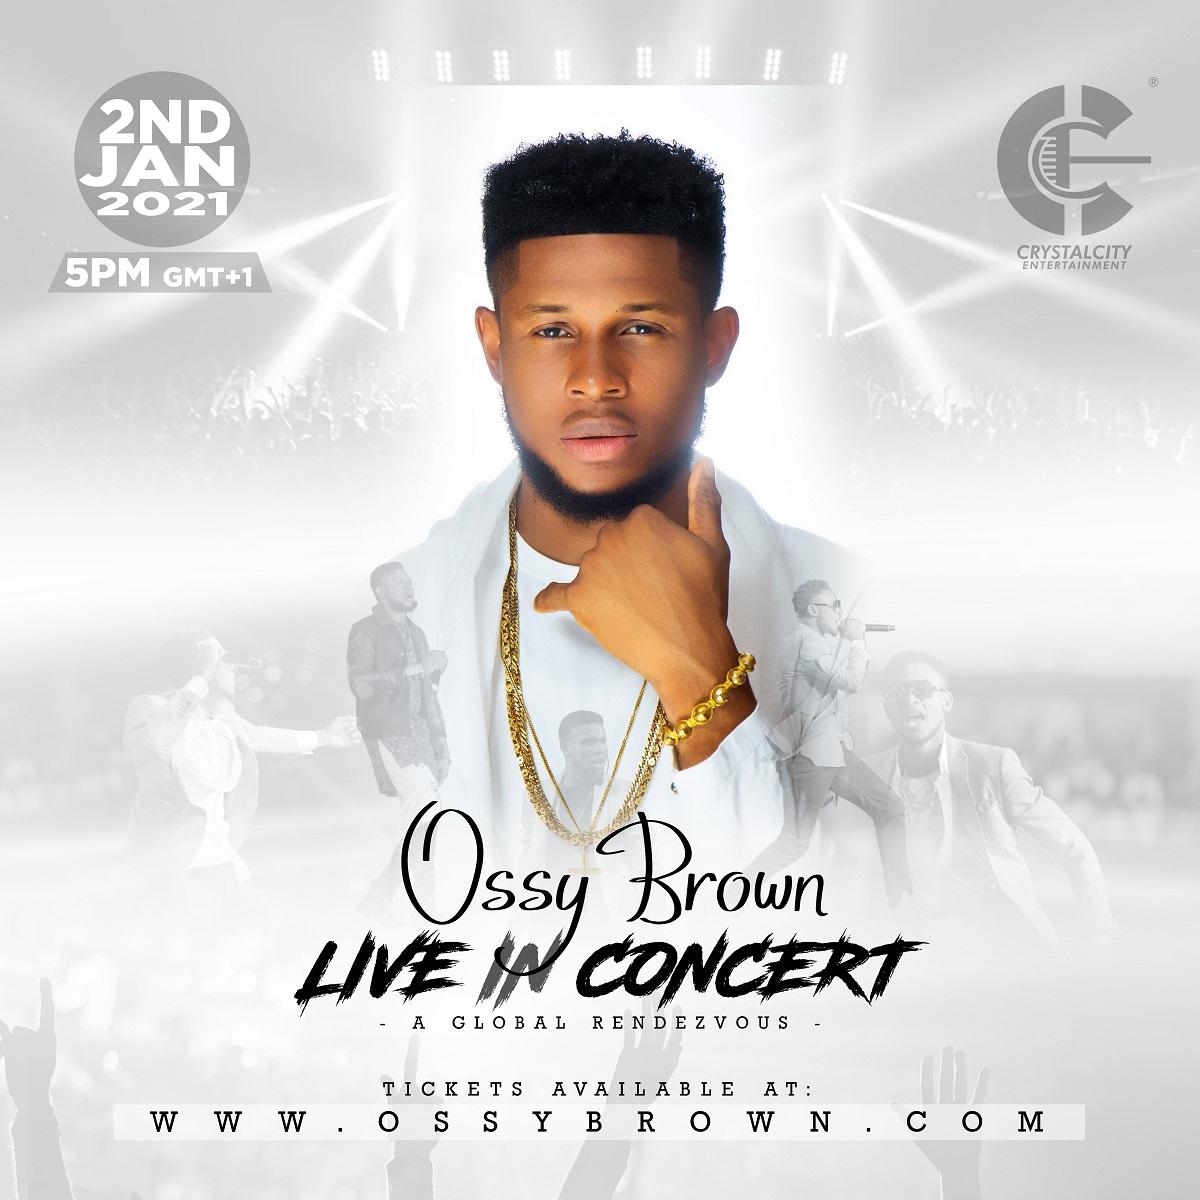 Ossy Brown Announce Live Gospel Concert